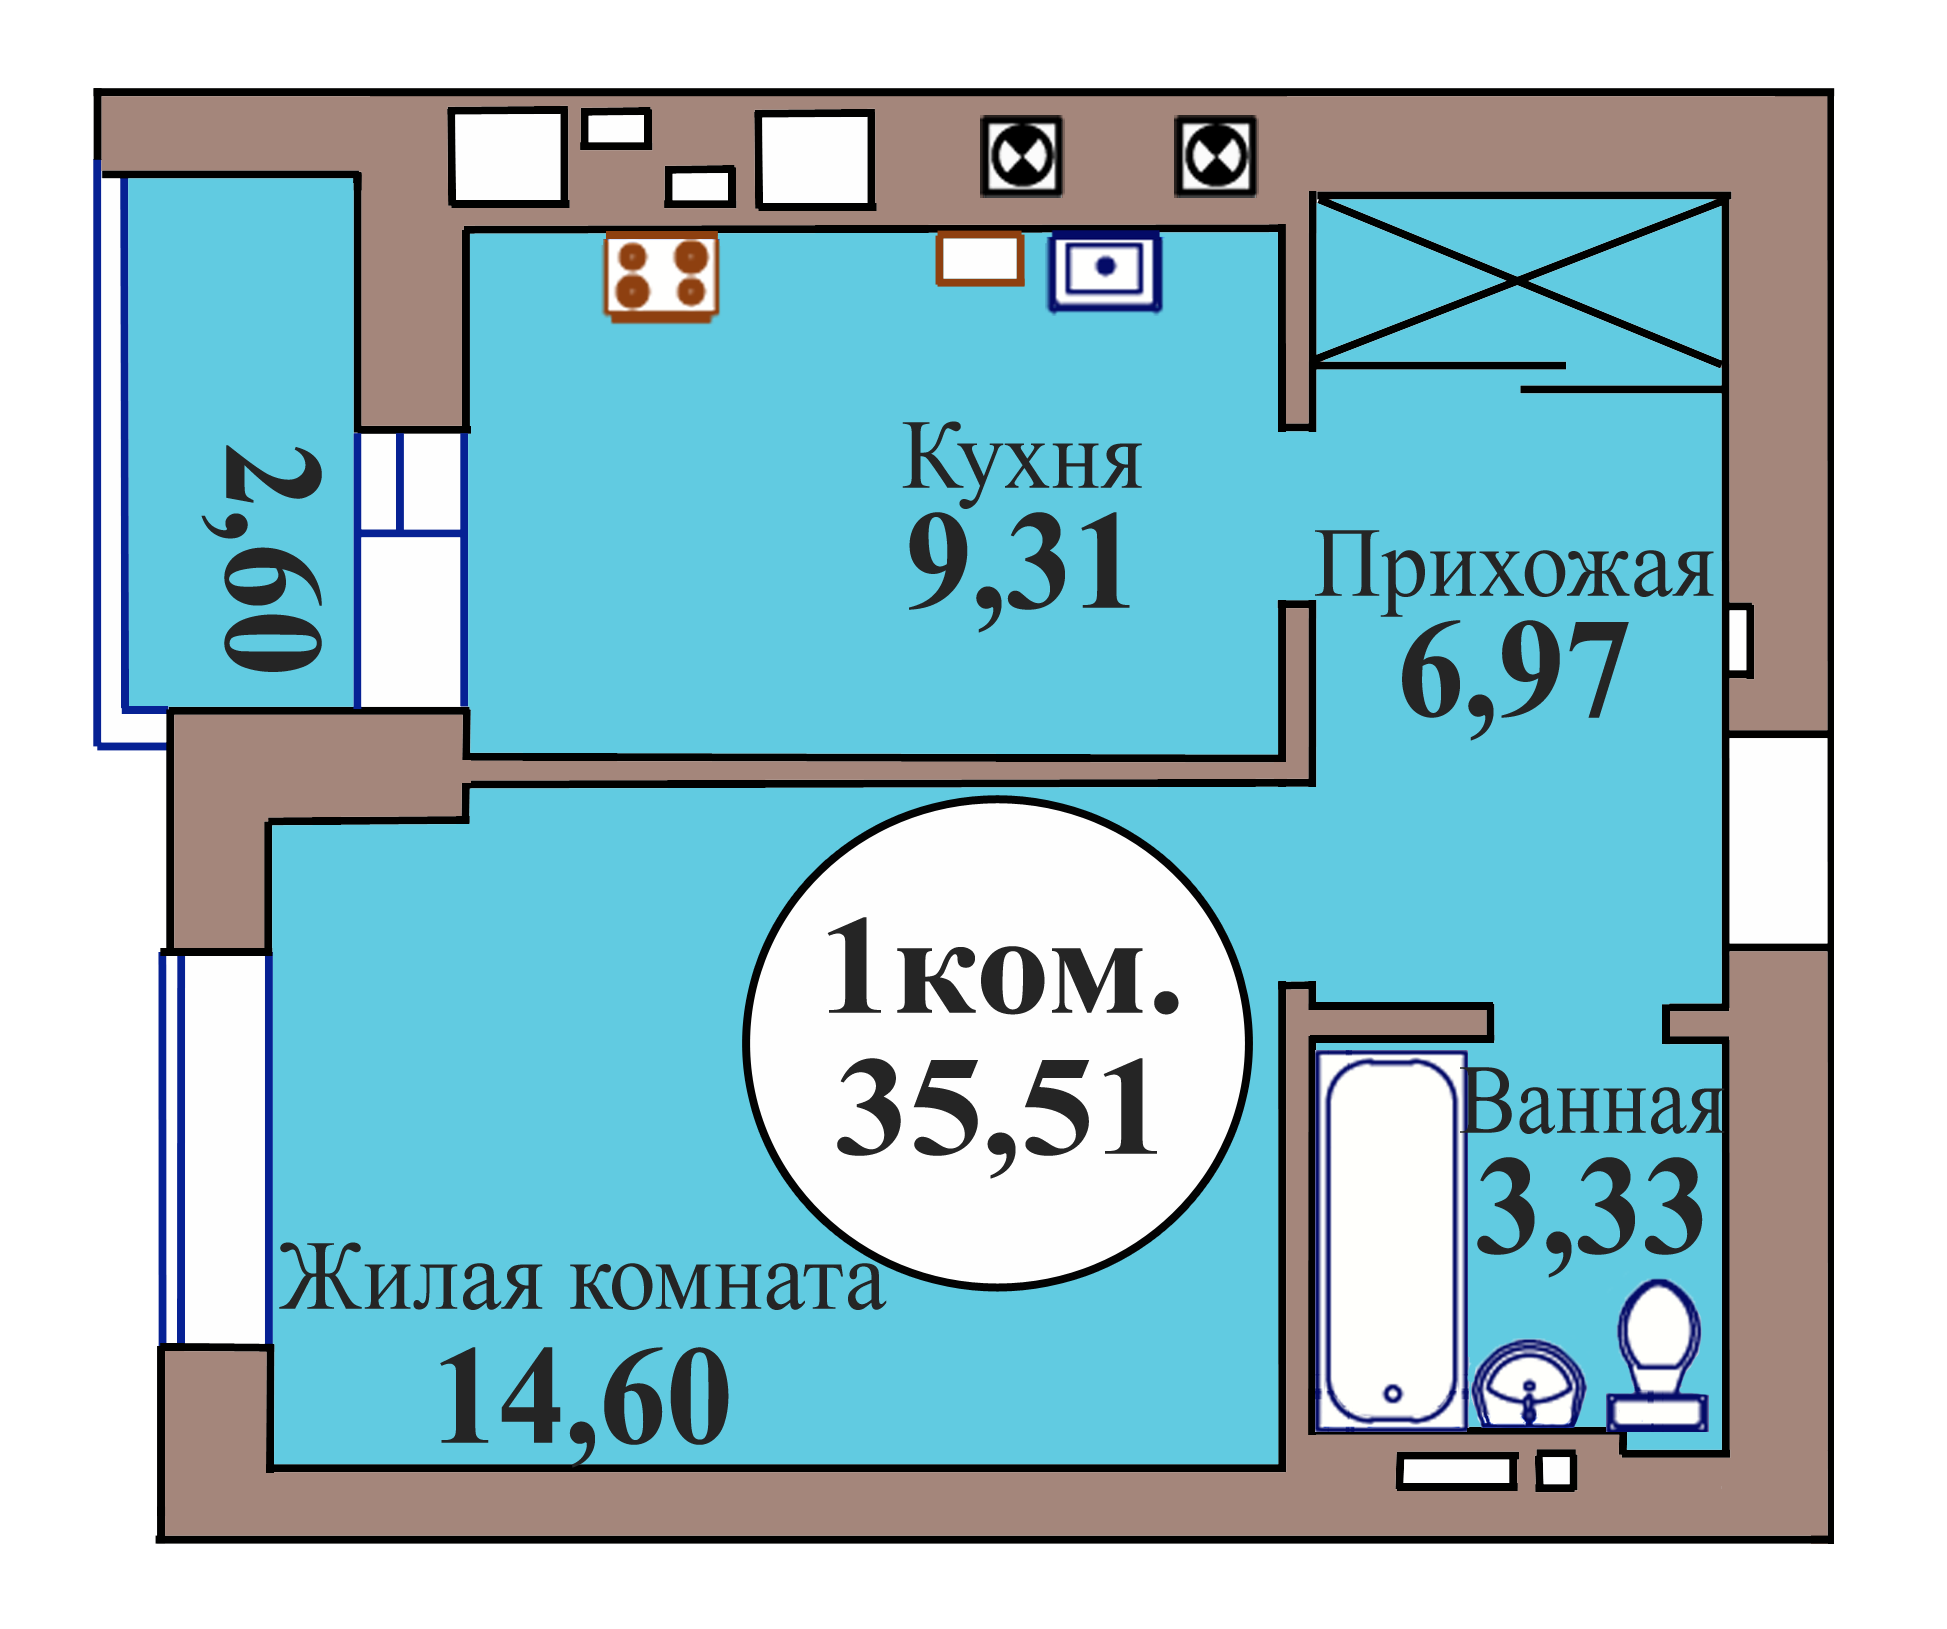 1-комн. кв. по пер. Калининградский, 5 кв. 46 в Калининграде